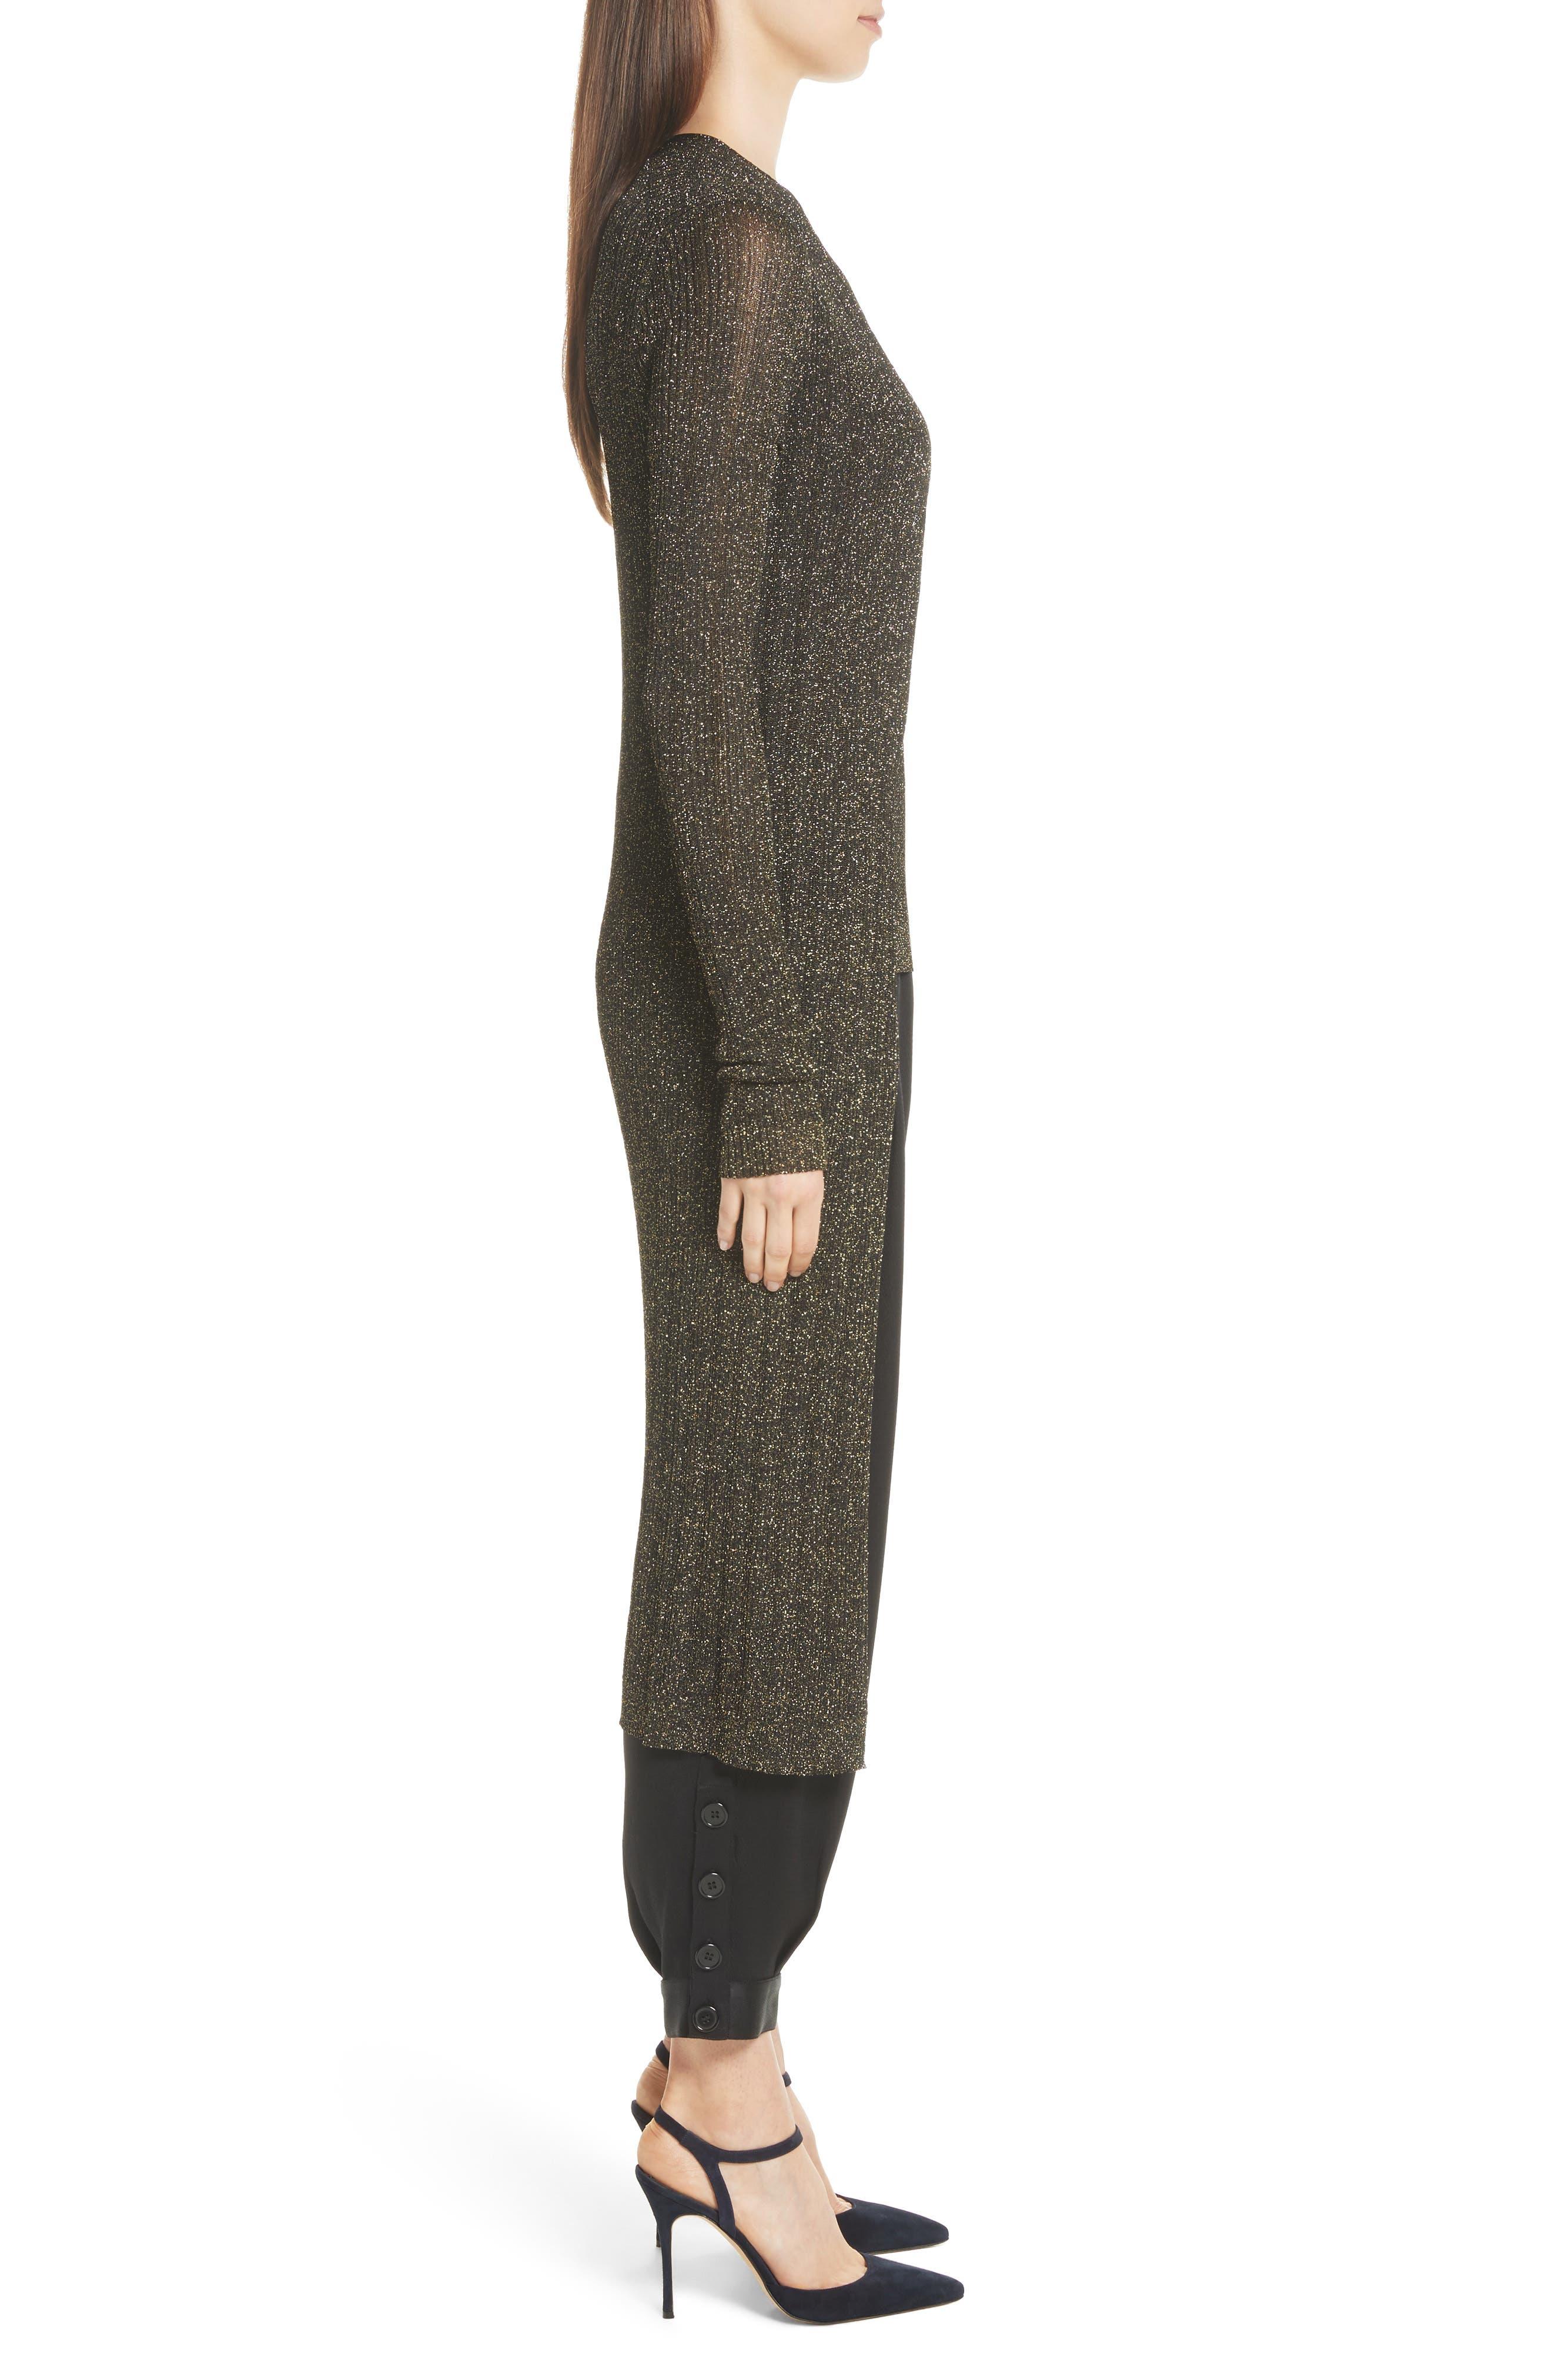 LaSalle Metallic Knit Long Cardigan,                             Alternate thumbnail 3, color,                             011